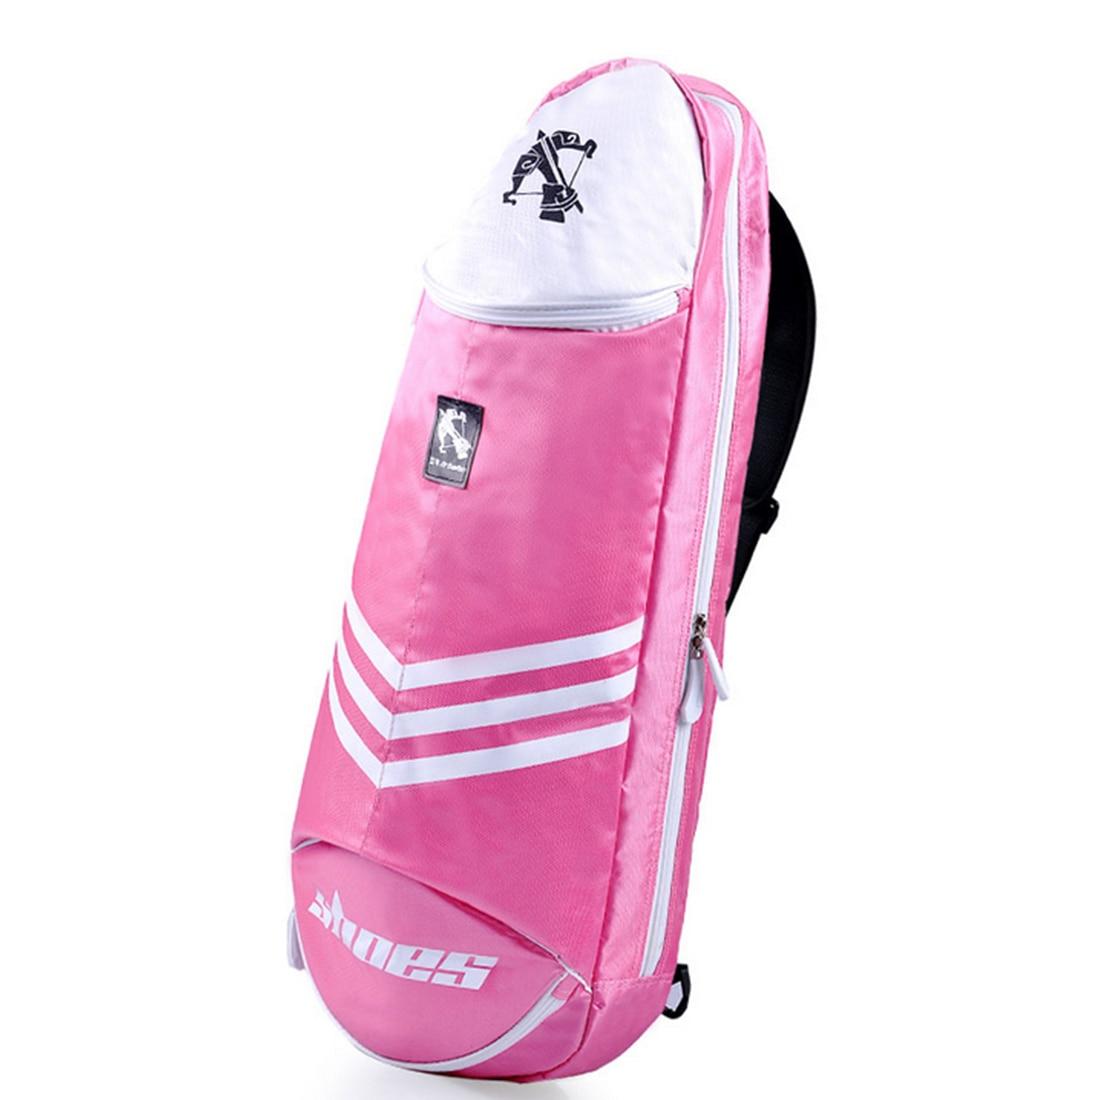 Big Racquet Sports Bag Badminton Bag Crossbow Waterproof Multi-layer Placement Tennis Racket Dacron Shoulder BagBig Racquet Sports Bag Badminton Bag Crossbow Waterproof Multi-layer Placement Tennis Racket Dacron Shoulder Bag